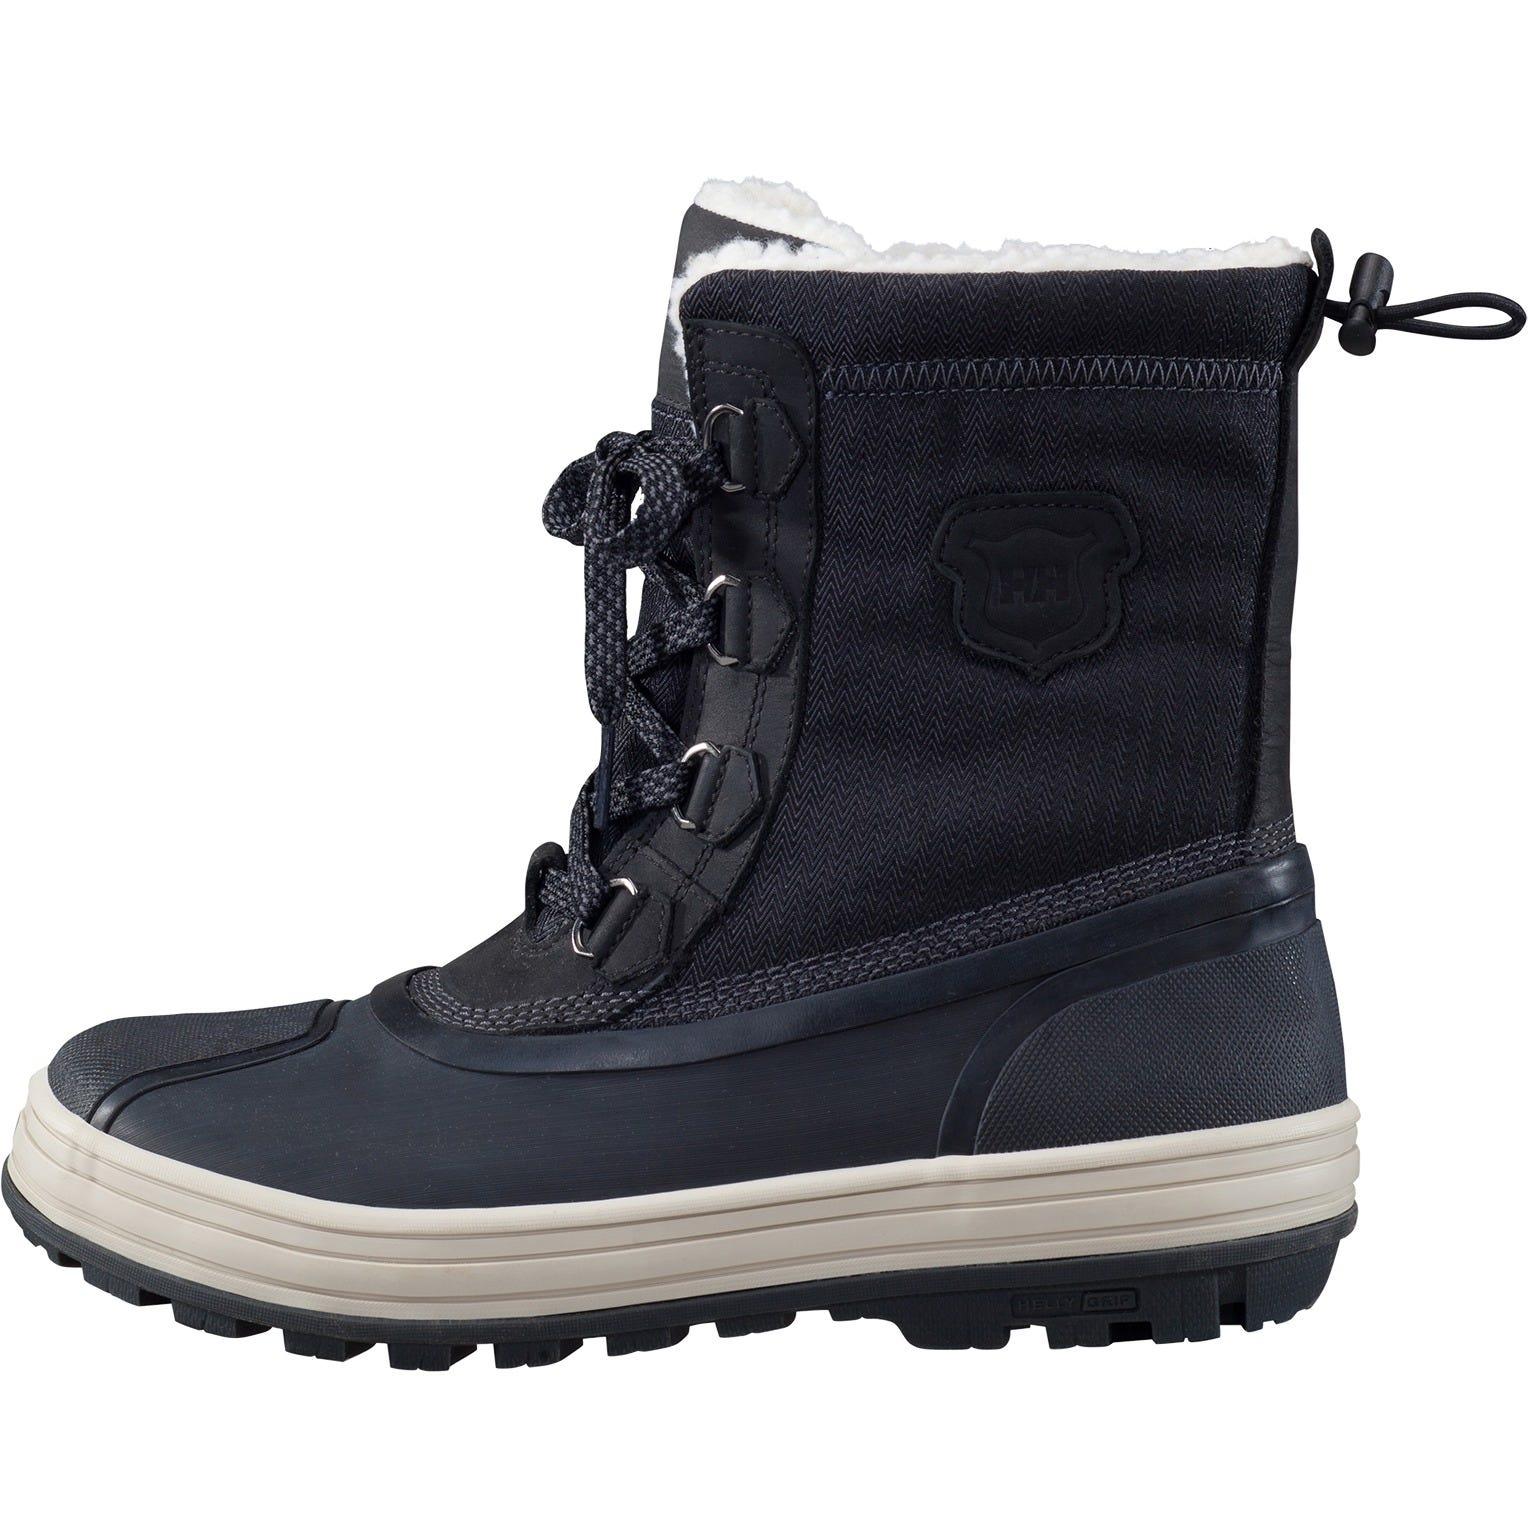 Helly Hansen W Framheim Womens Winter Boot Black 37/6